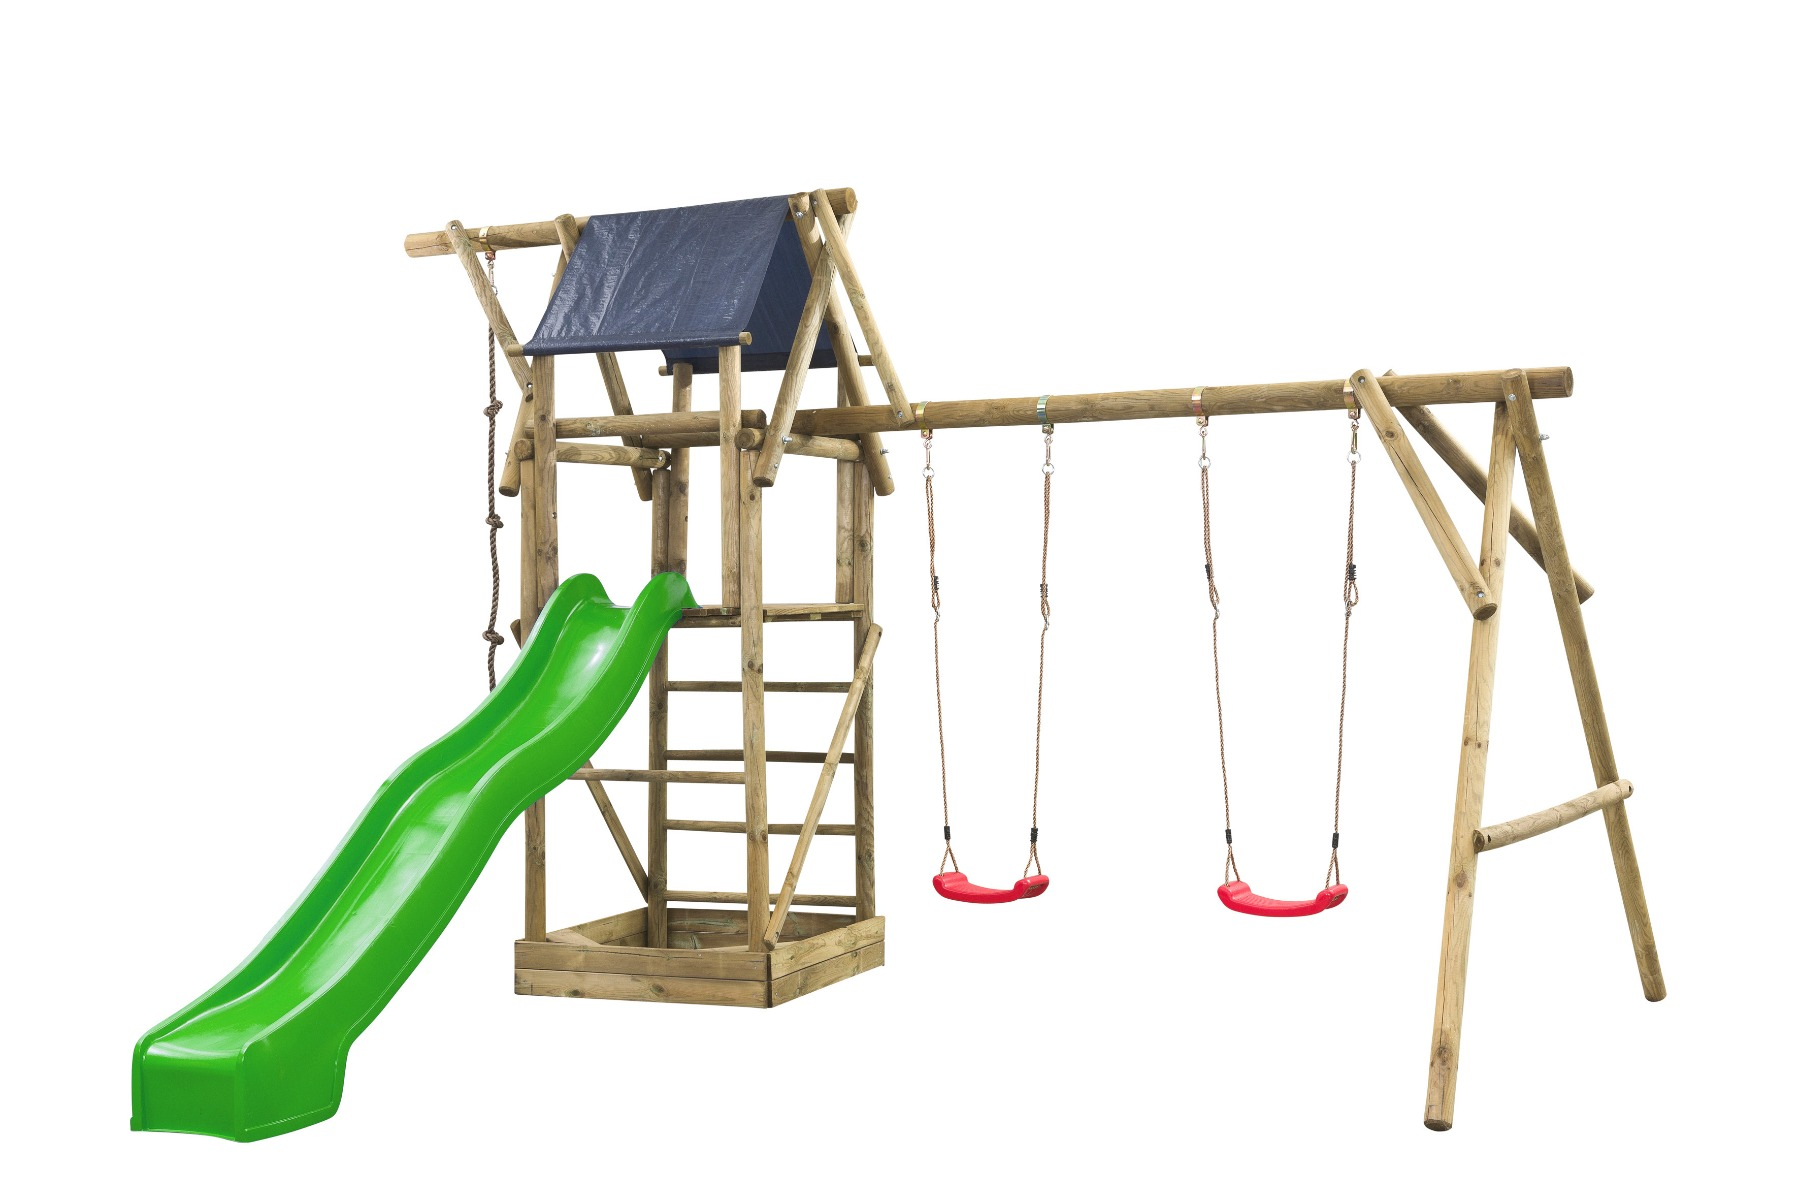 Houten speeltoestel Nelis 380x500x290cm